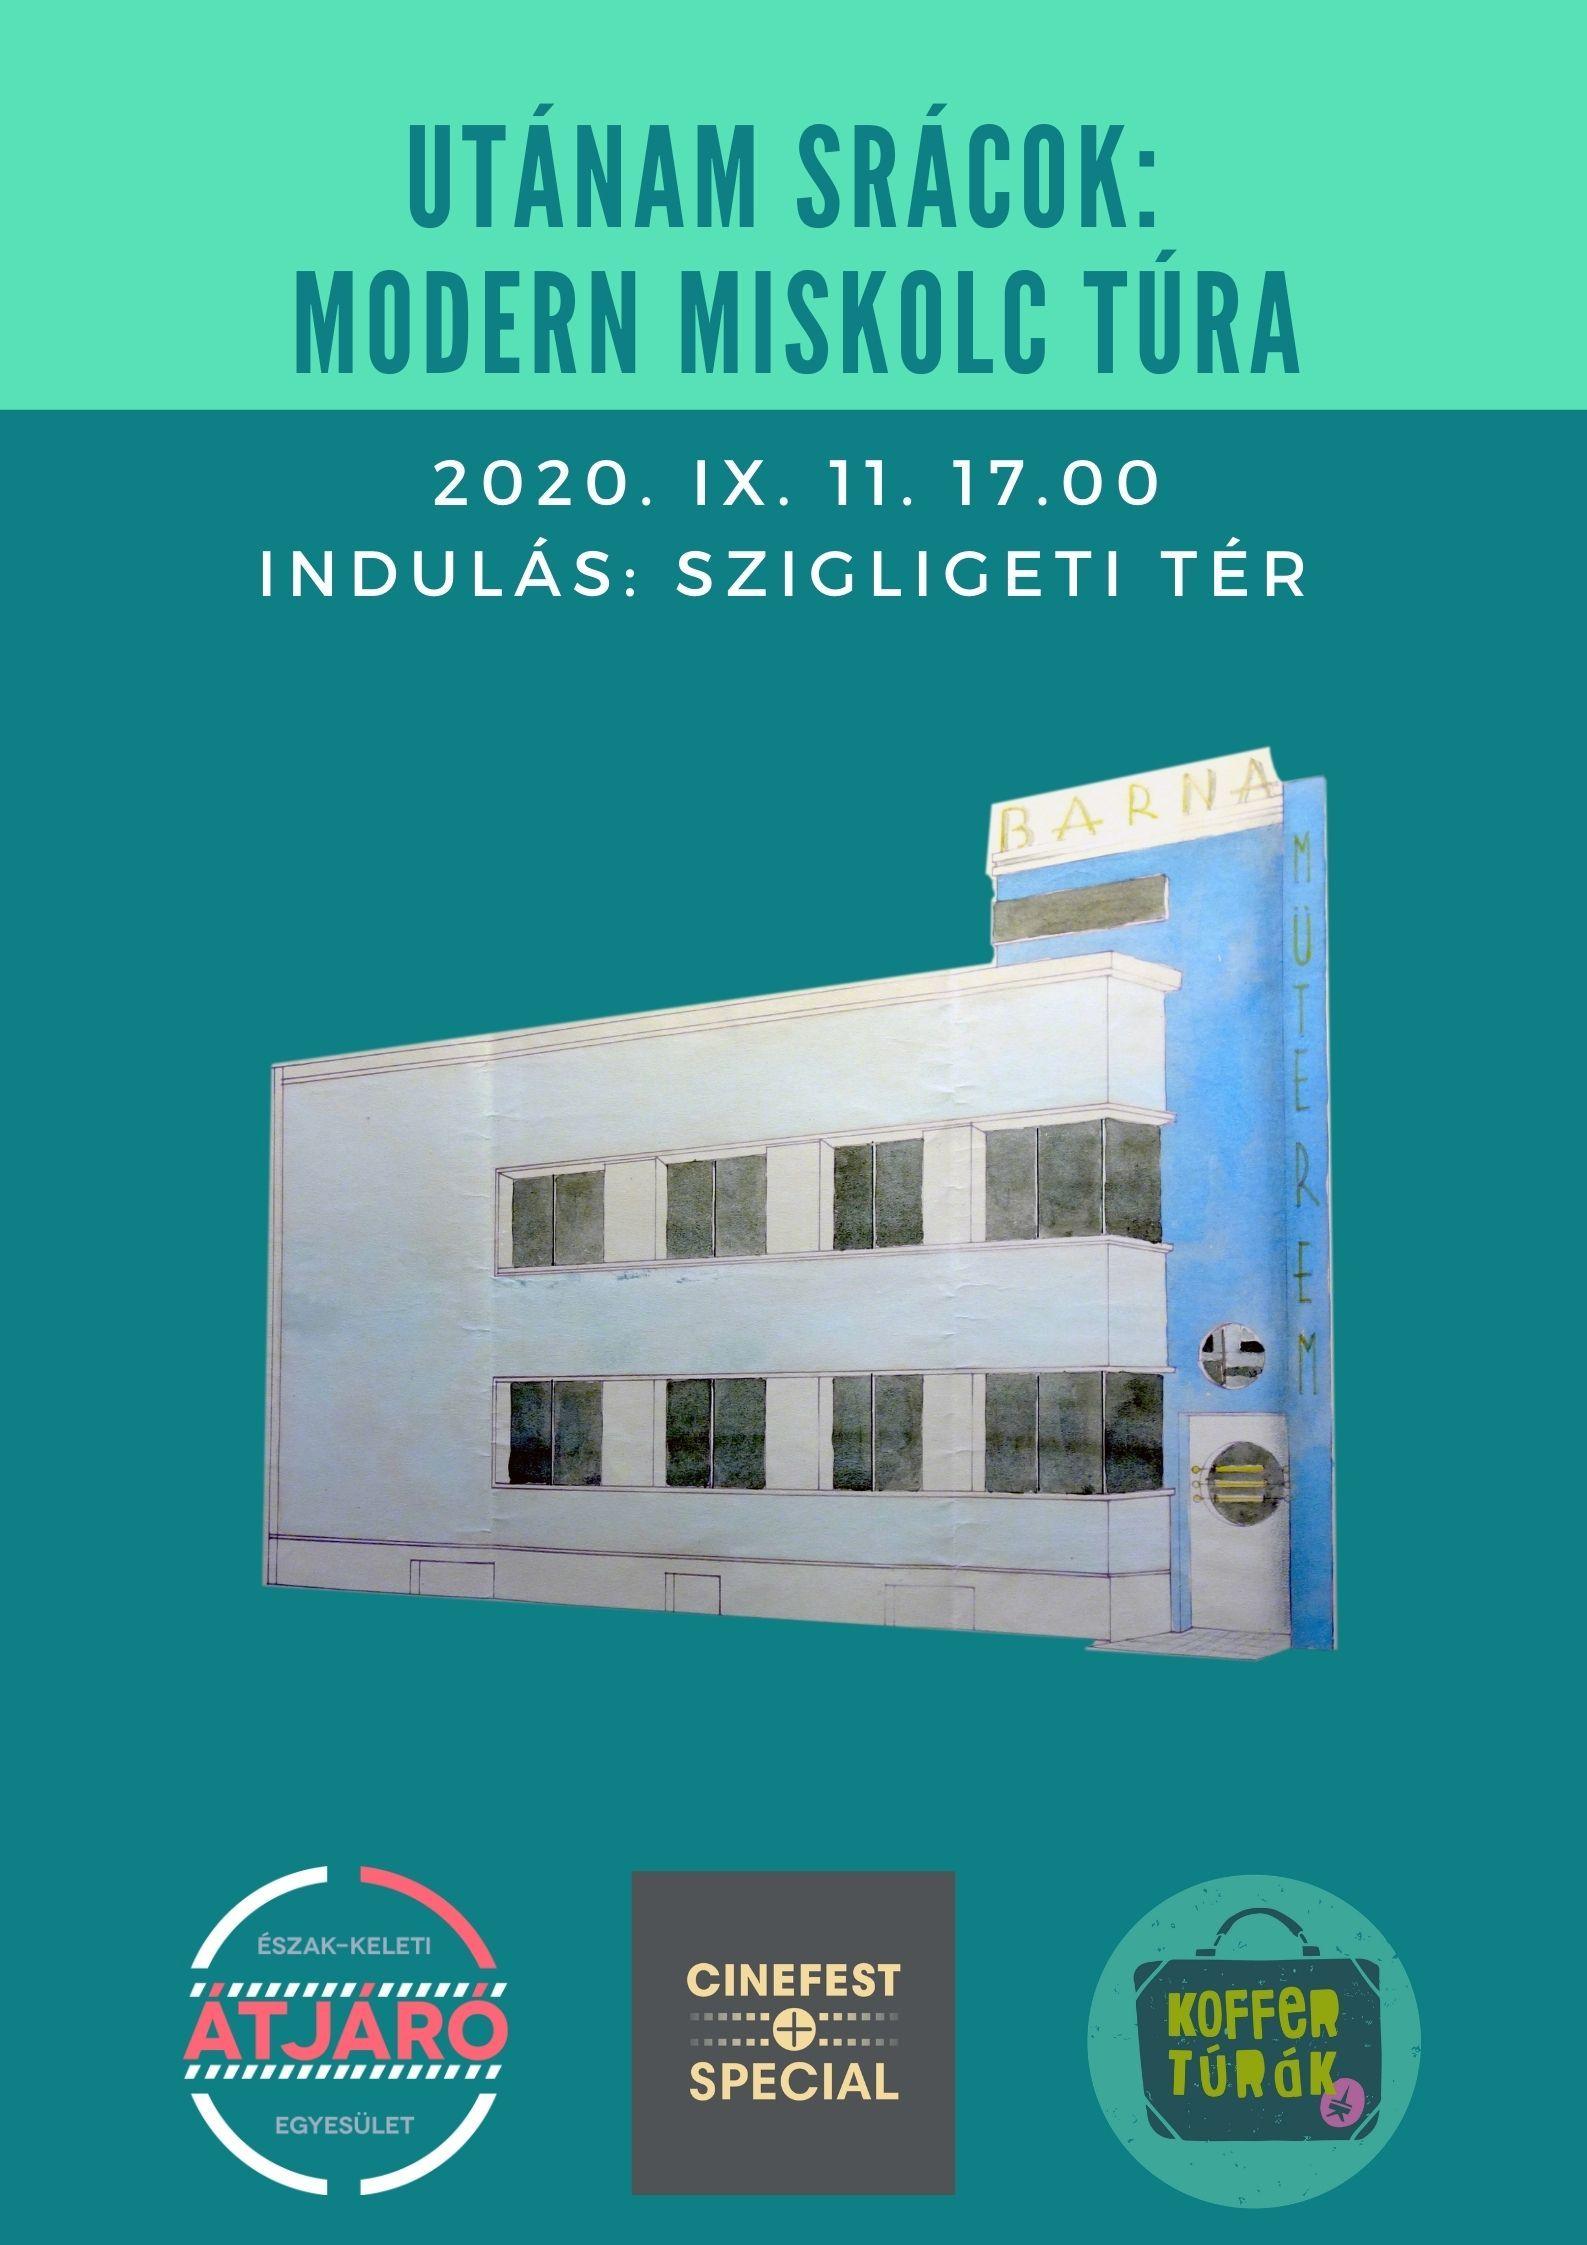 UTÁNAM SRÁCOK MODERN MISKOLC TÚRA-2